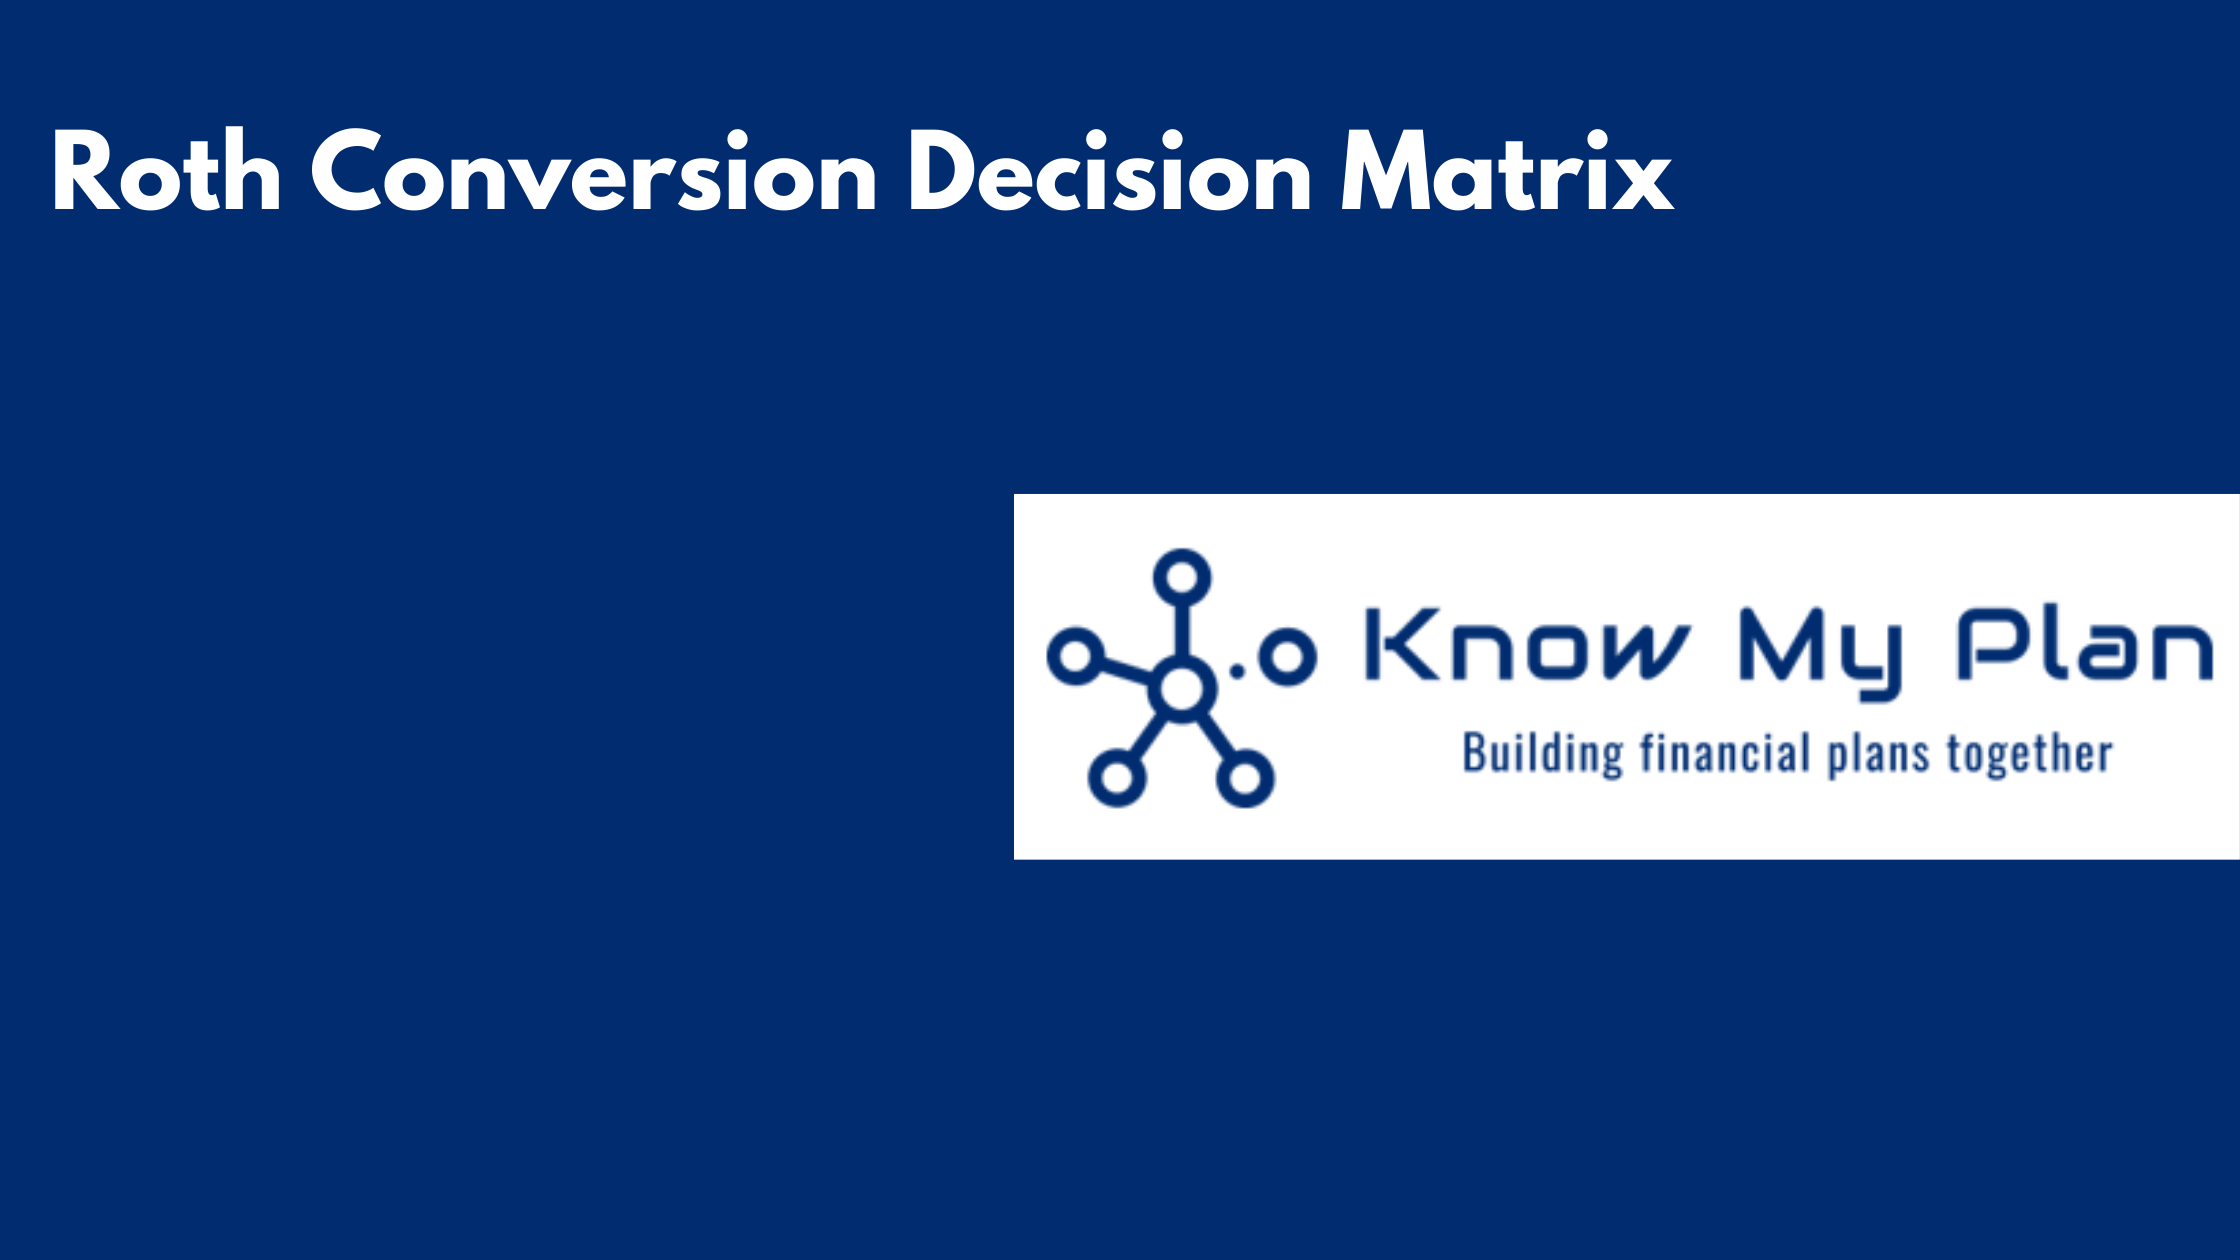 Roth Conversion Decision Matrix Thumbnail